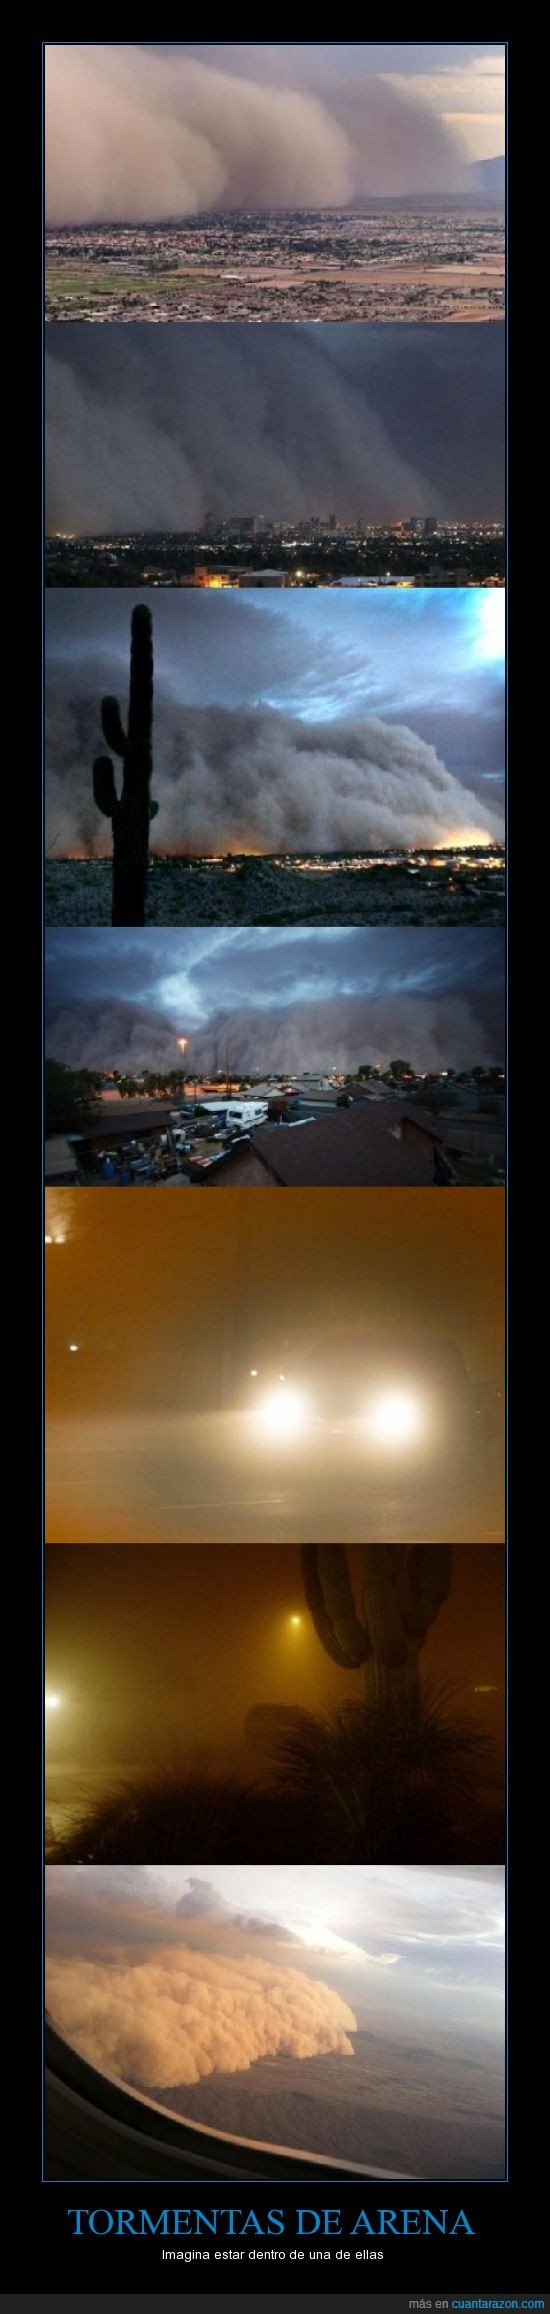 arena,Arizona,eeuu,tormenta,viento